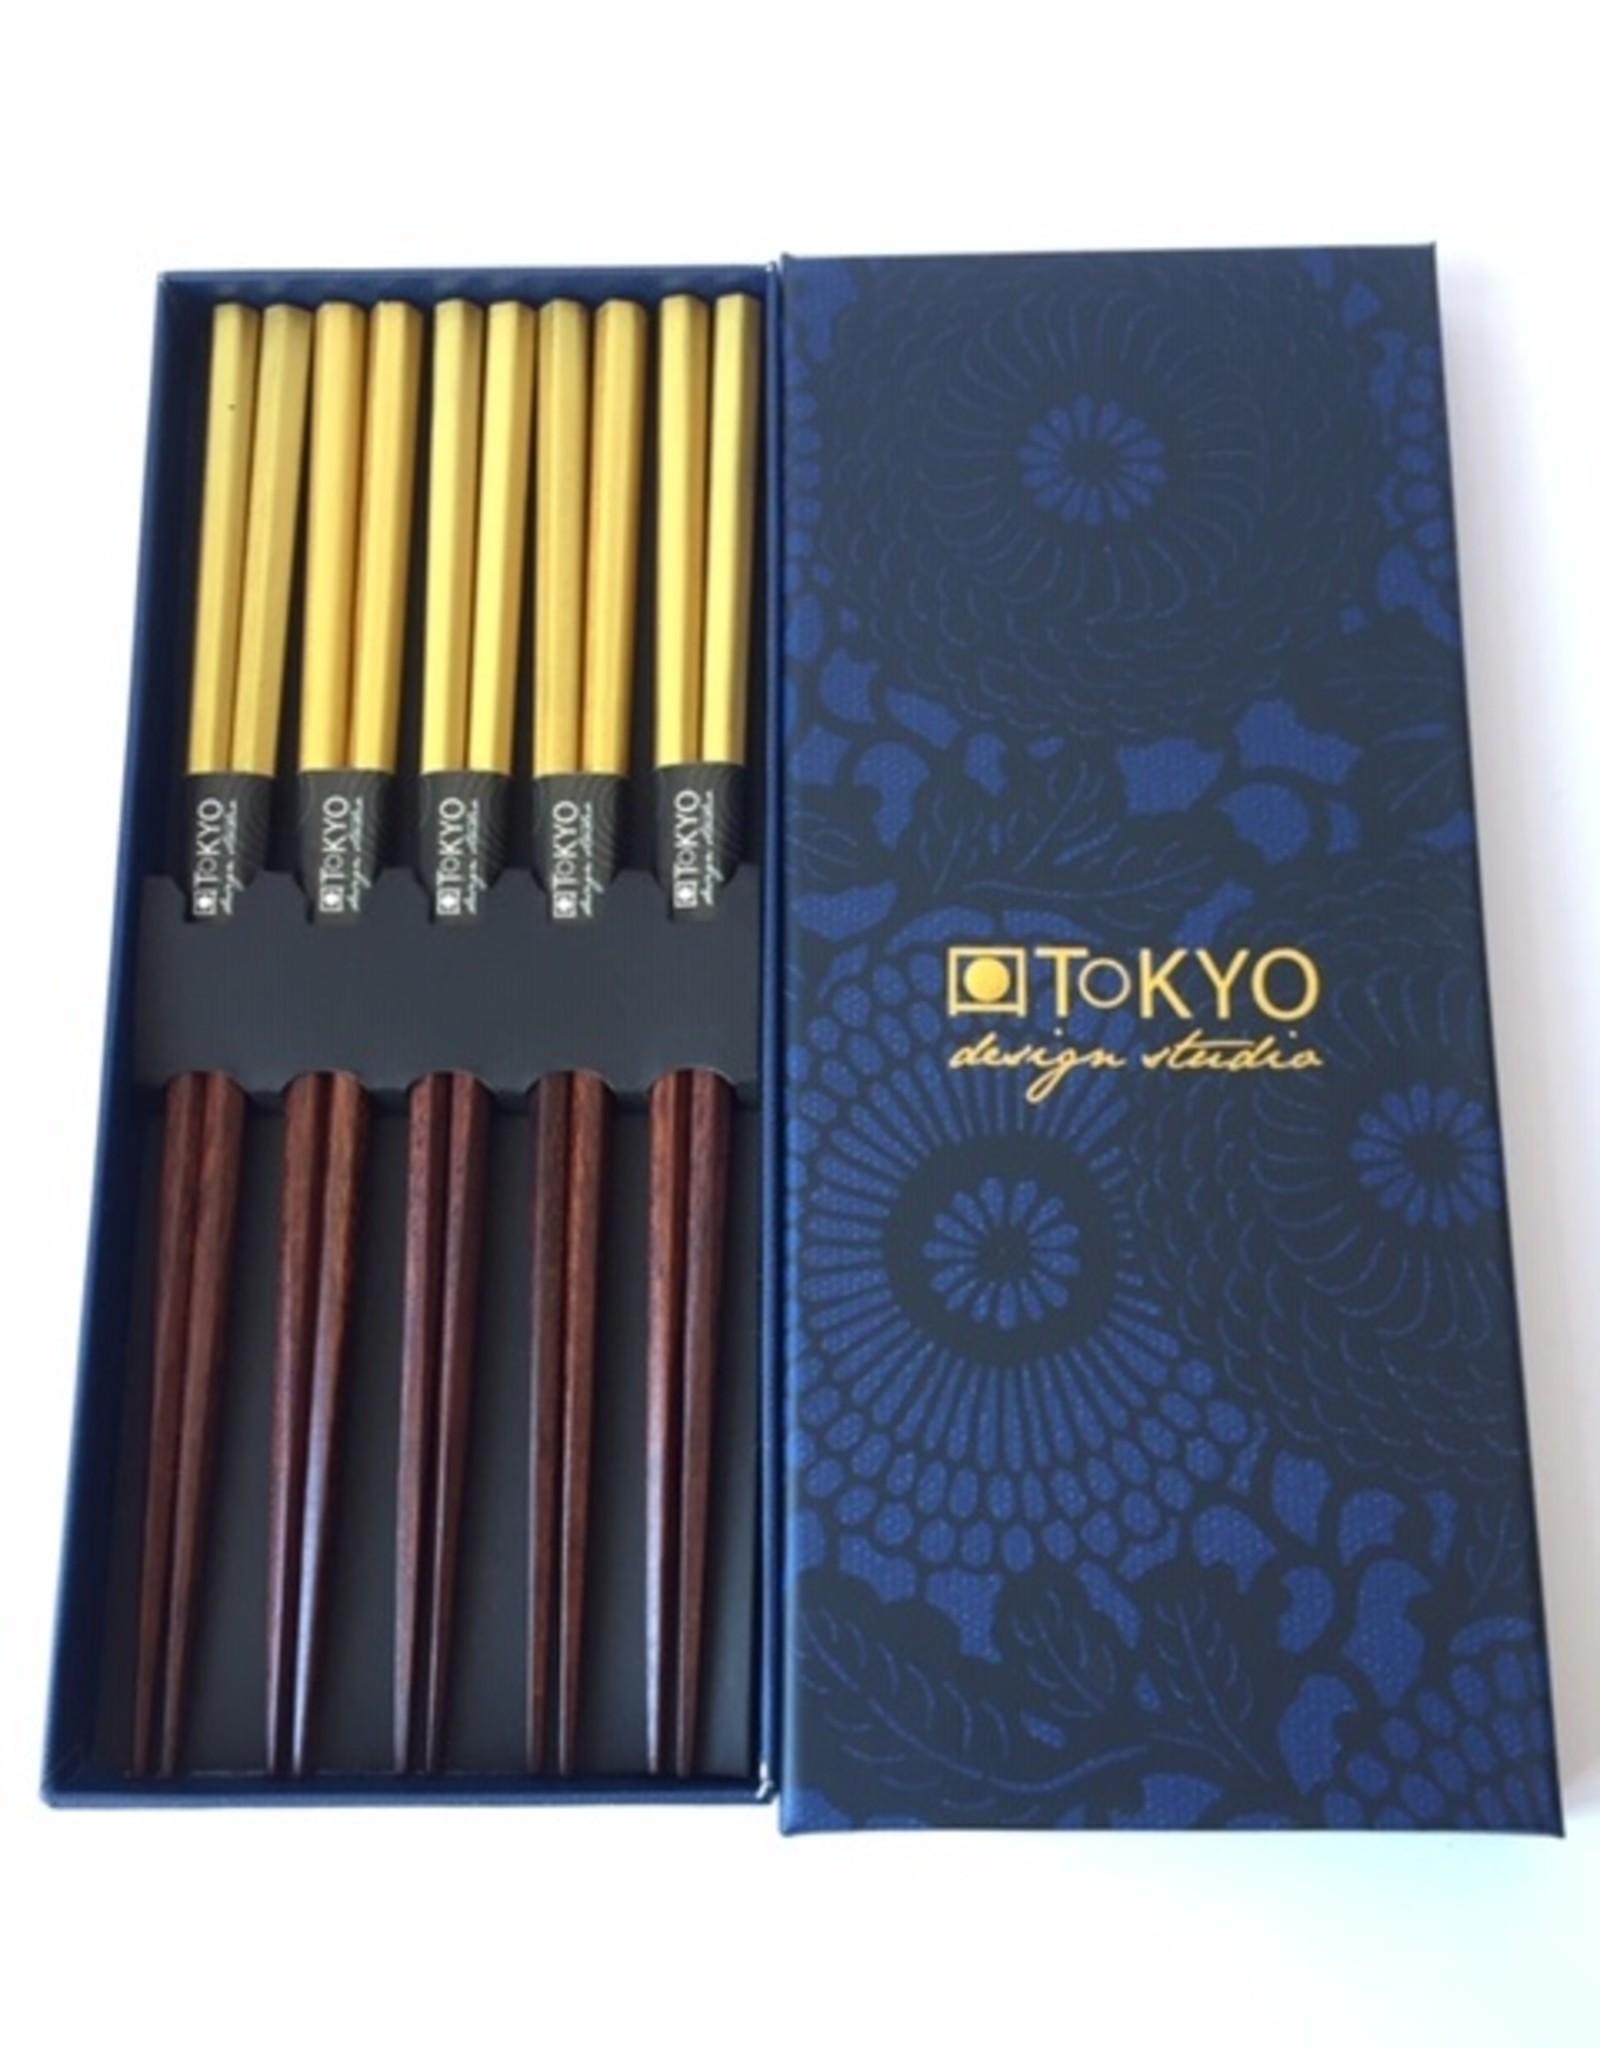 Tokyo Design Studio Japanse luxe chopsticks Goud